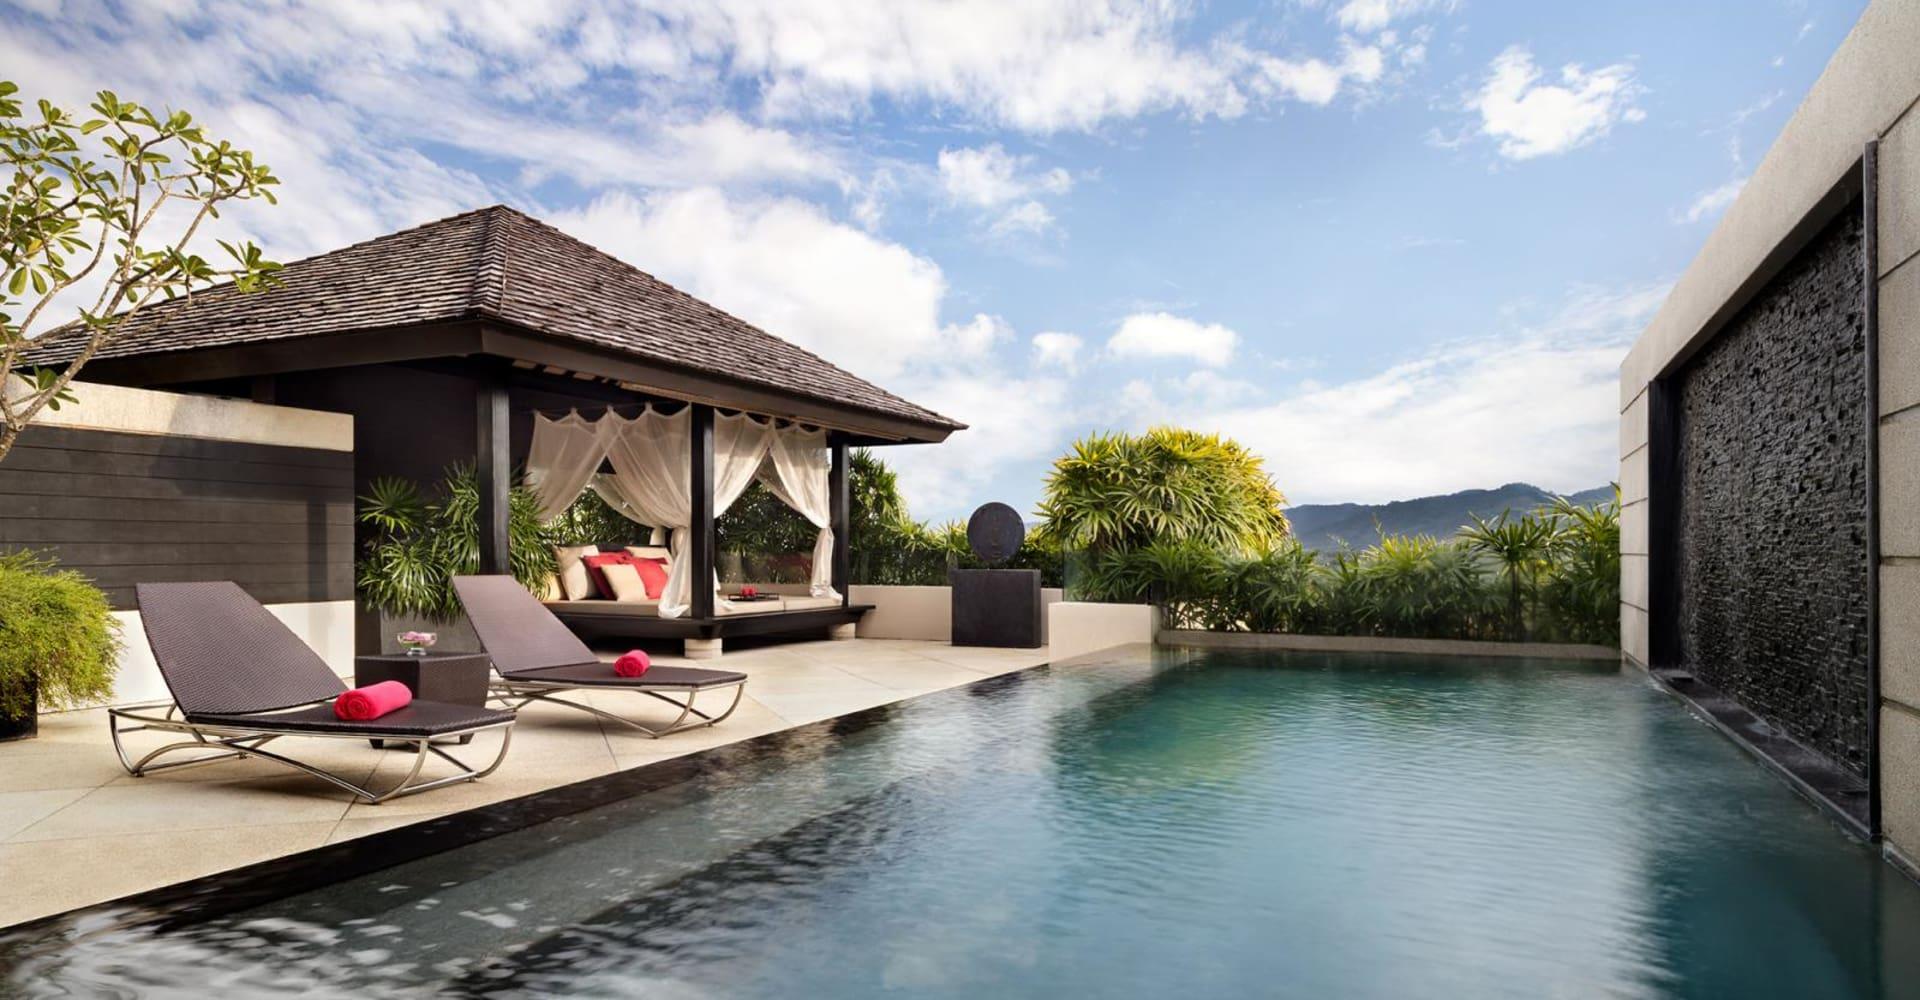 Spa & Pool Pavilion - The Pavilions Phuket